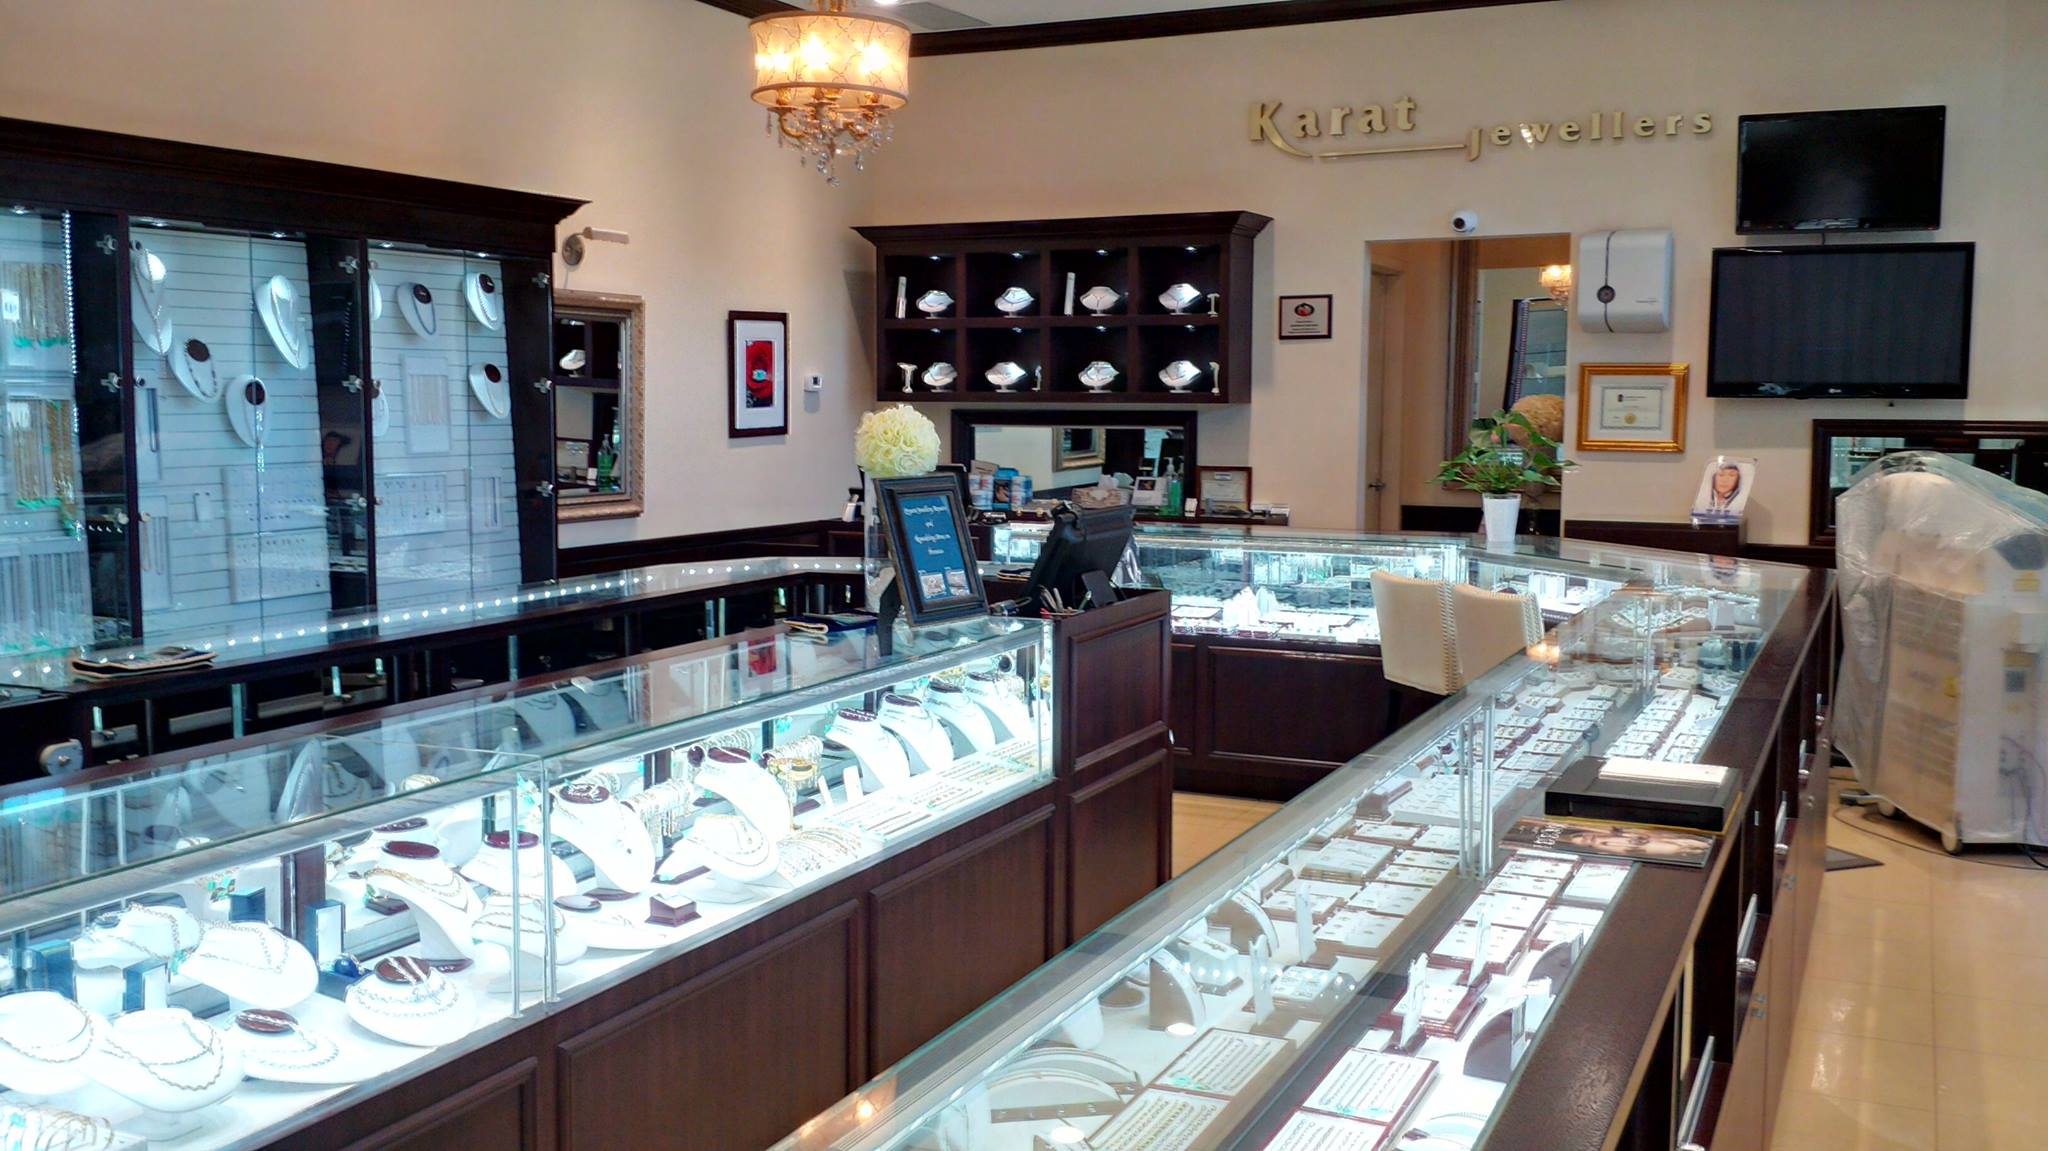 Karat Jewellers - Our Store